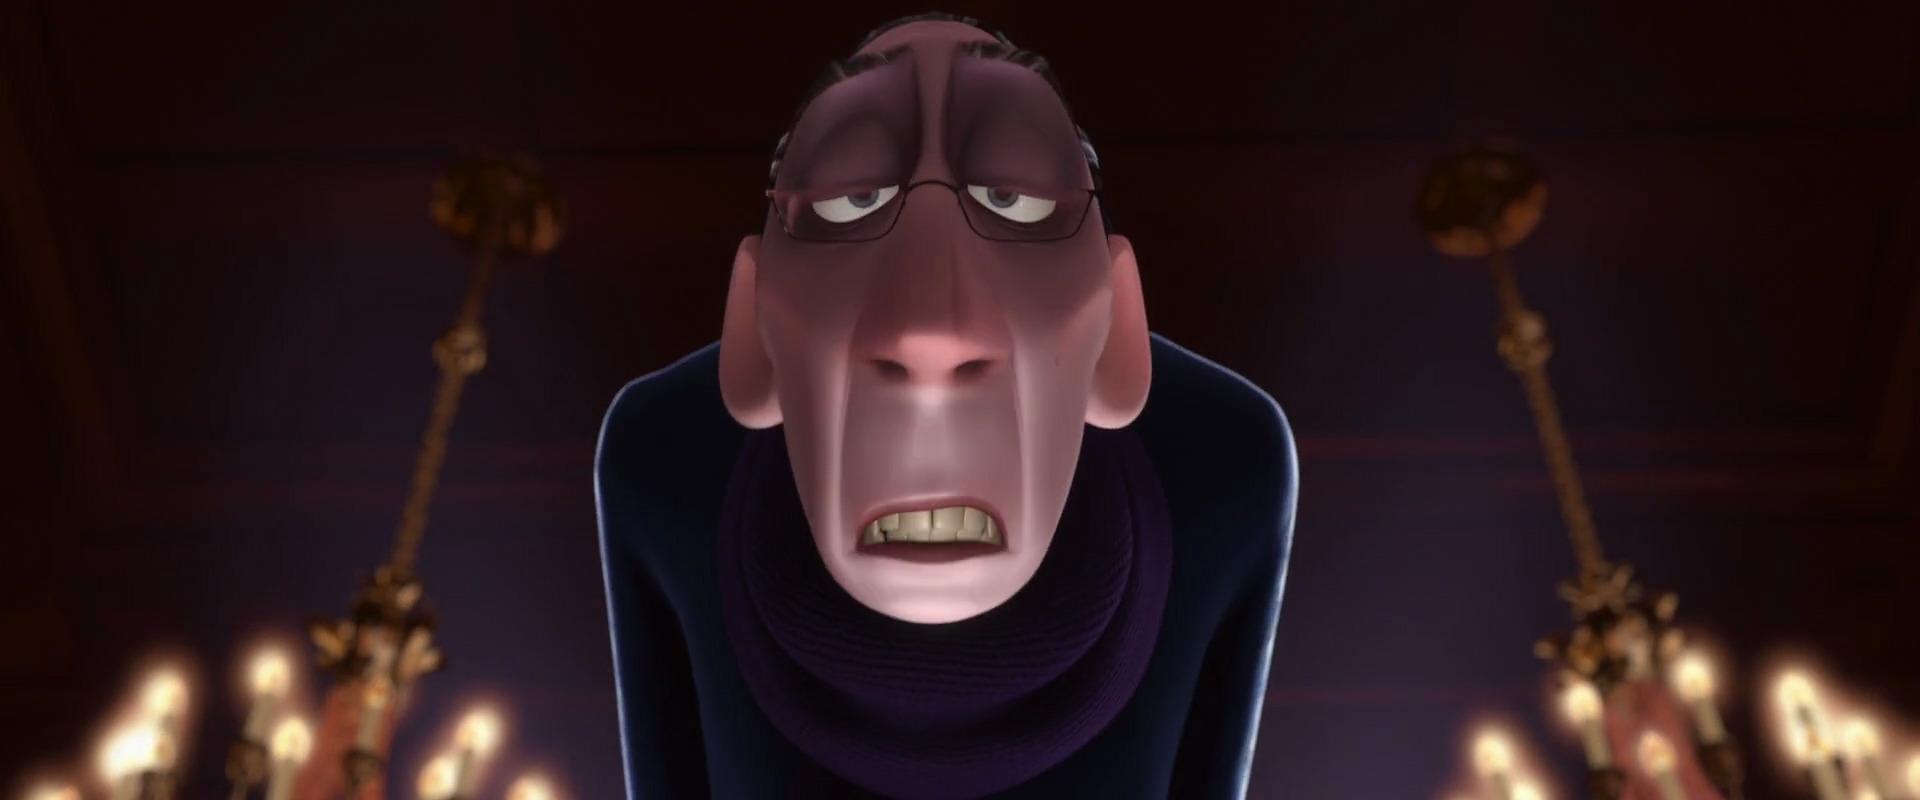 anton ego personnage character pixar disney ratatouille